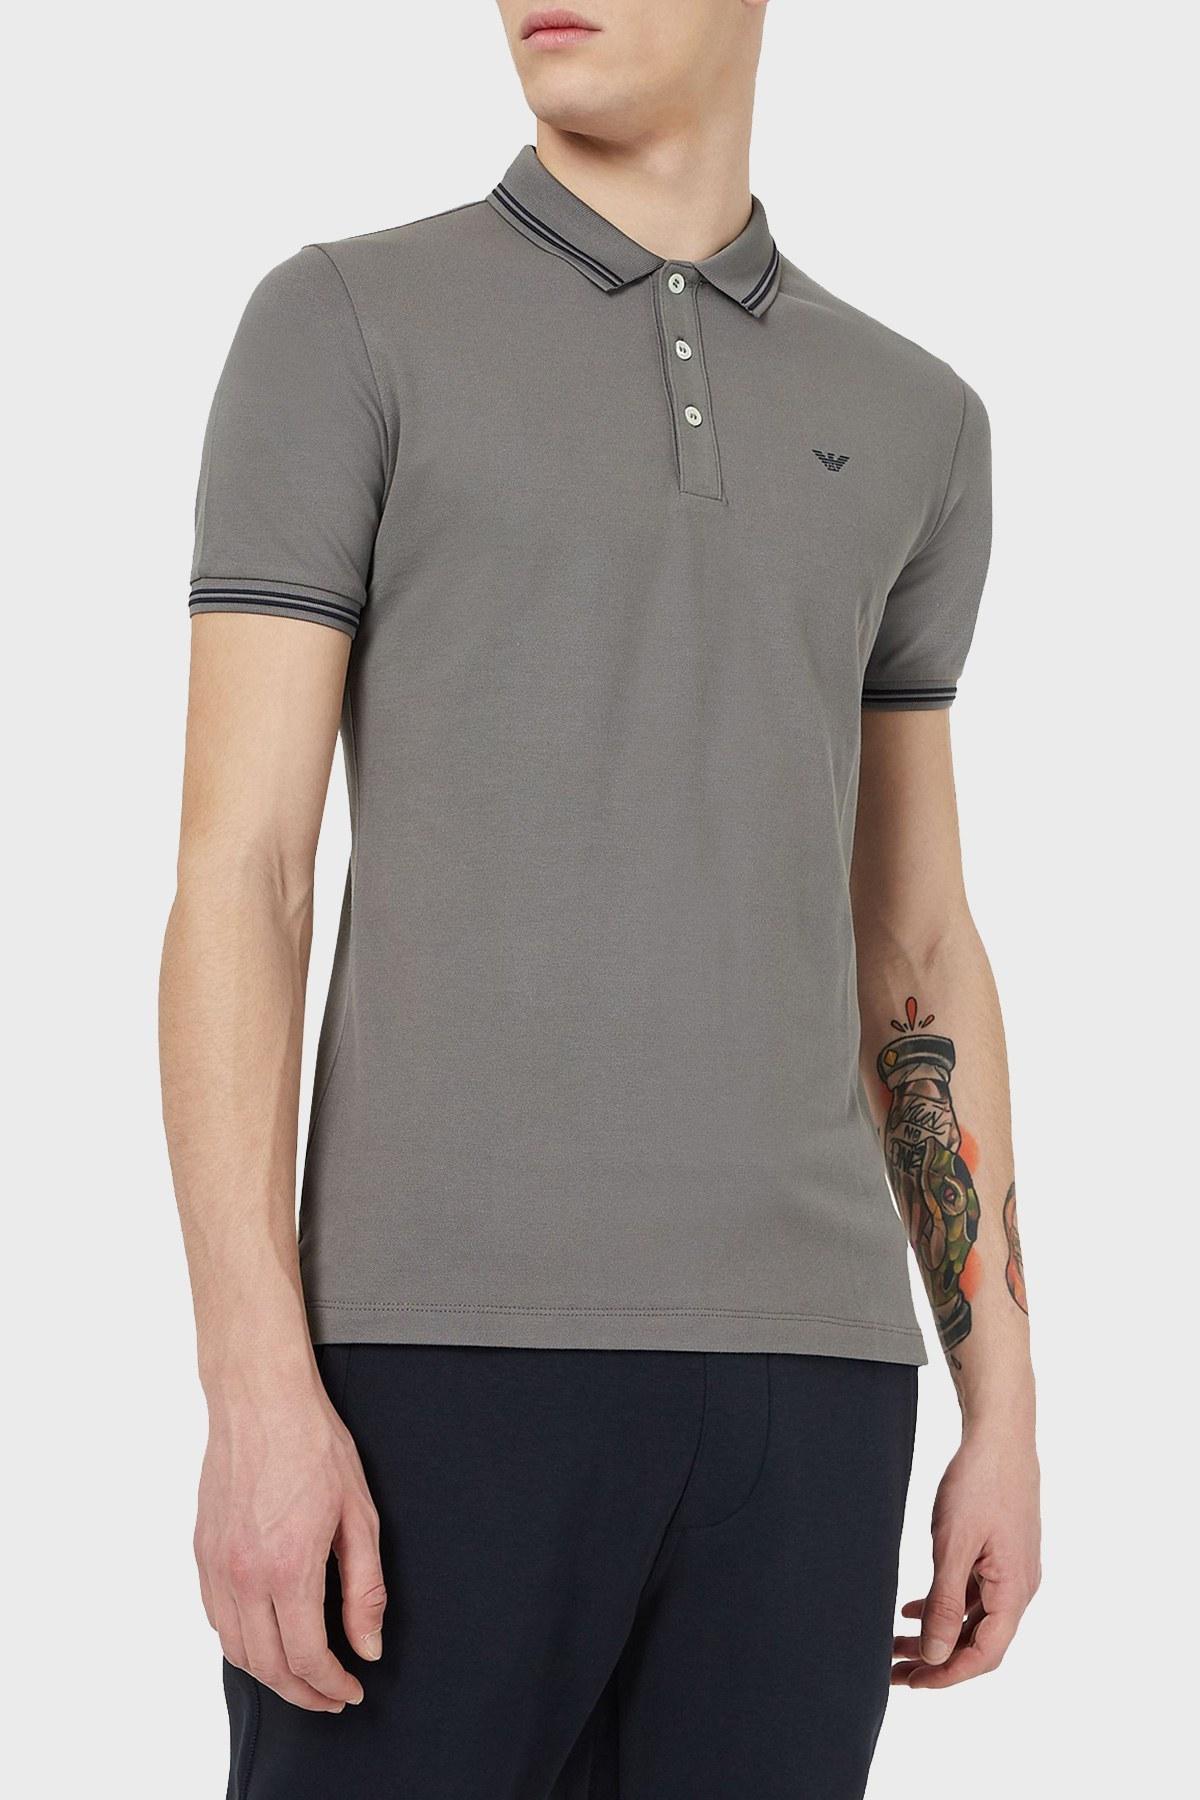 Emporio Armani T Shirt Erkek Polo 8N1F30 1JPTZ 0635 GRİ